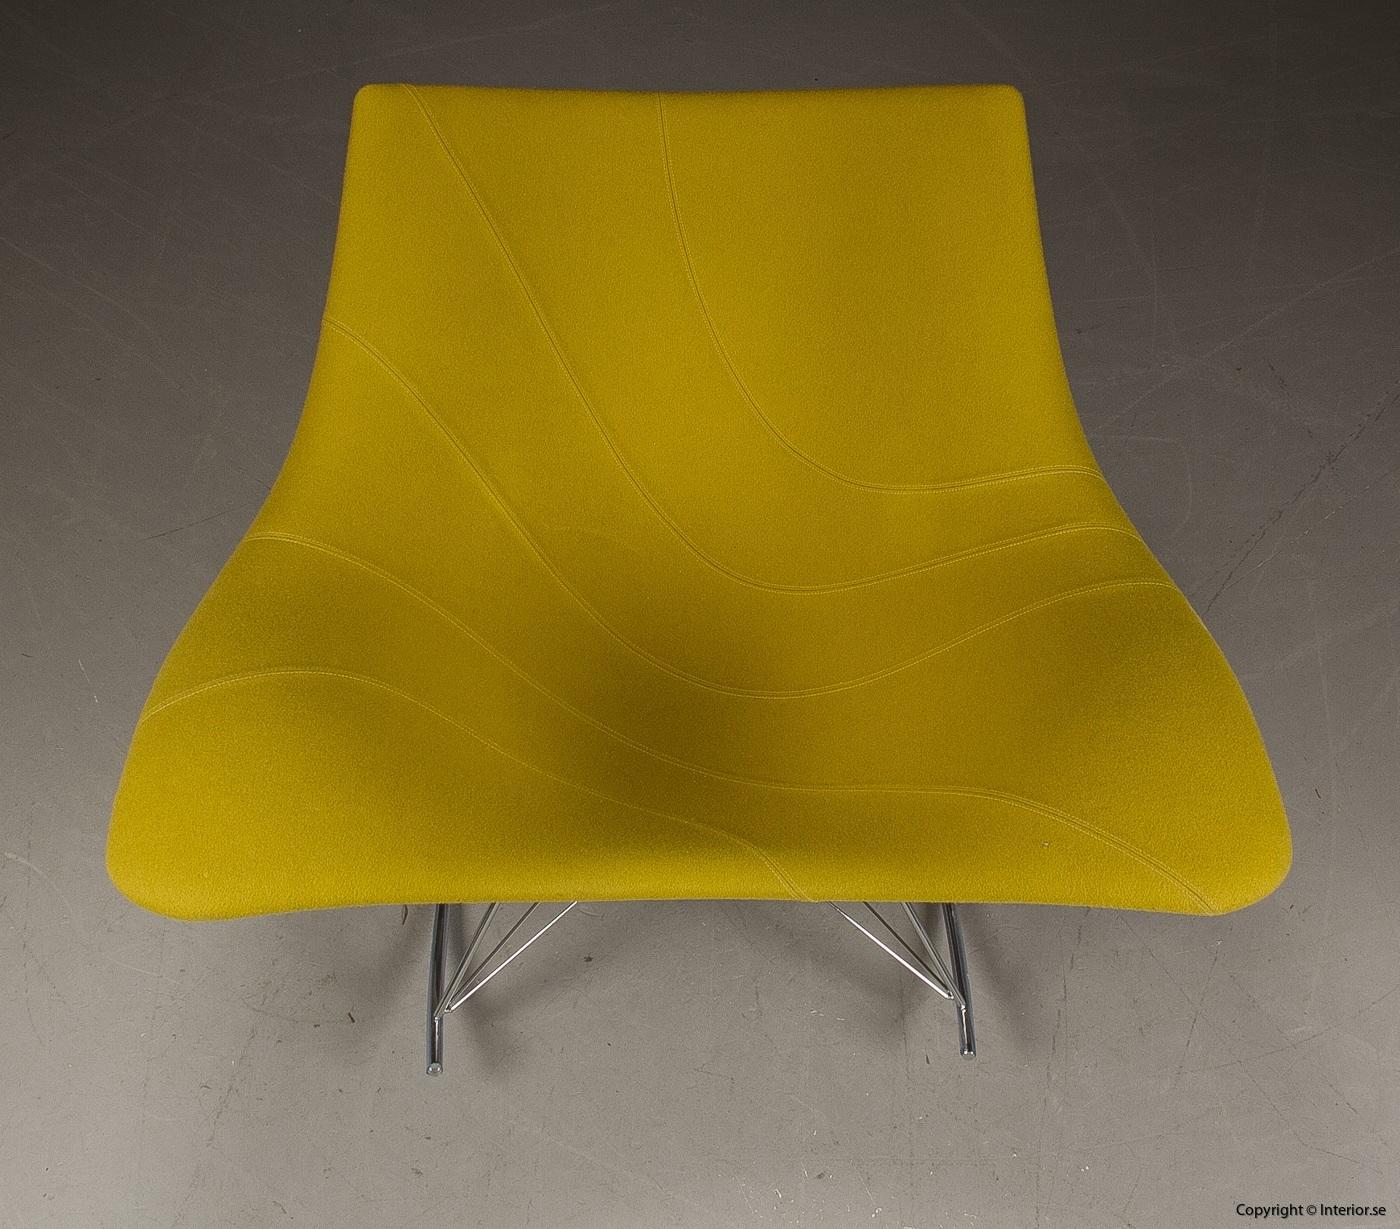 Gungstol fåtölj rocking chair, Fredericia Furniture Stingray - Klädd 4